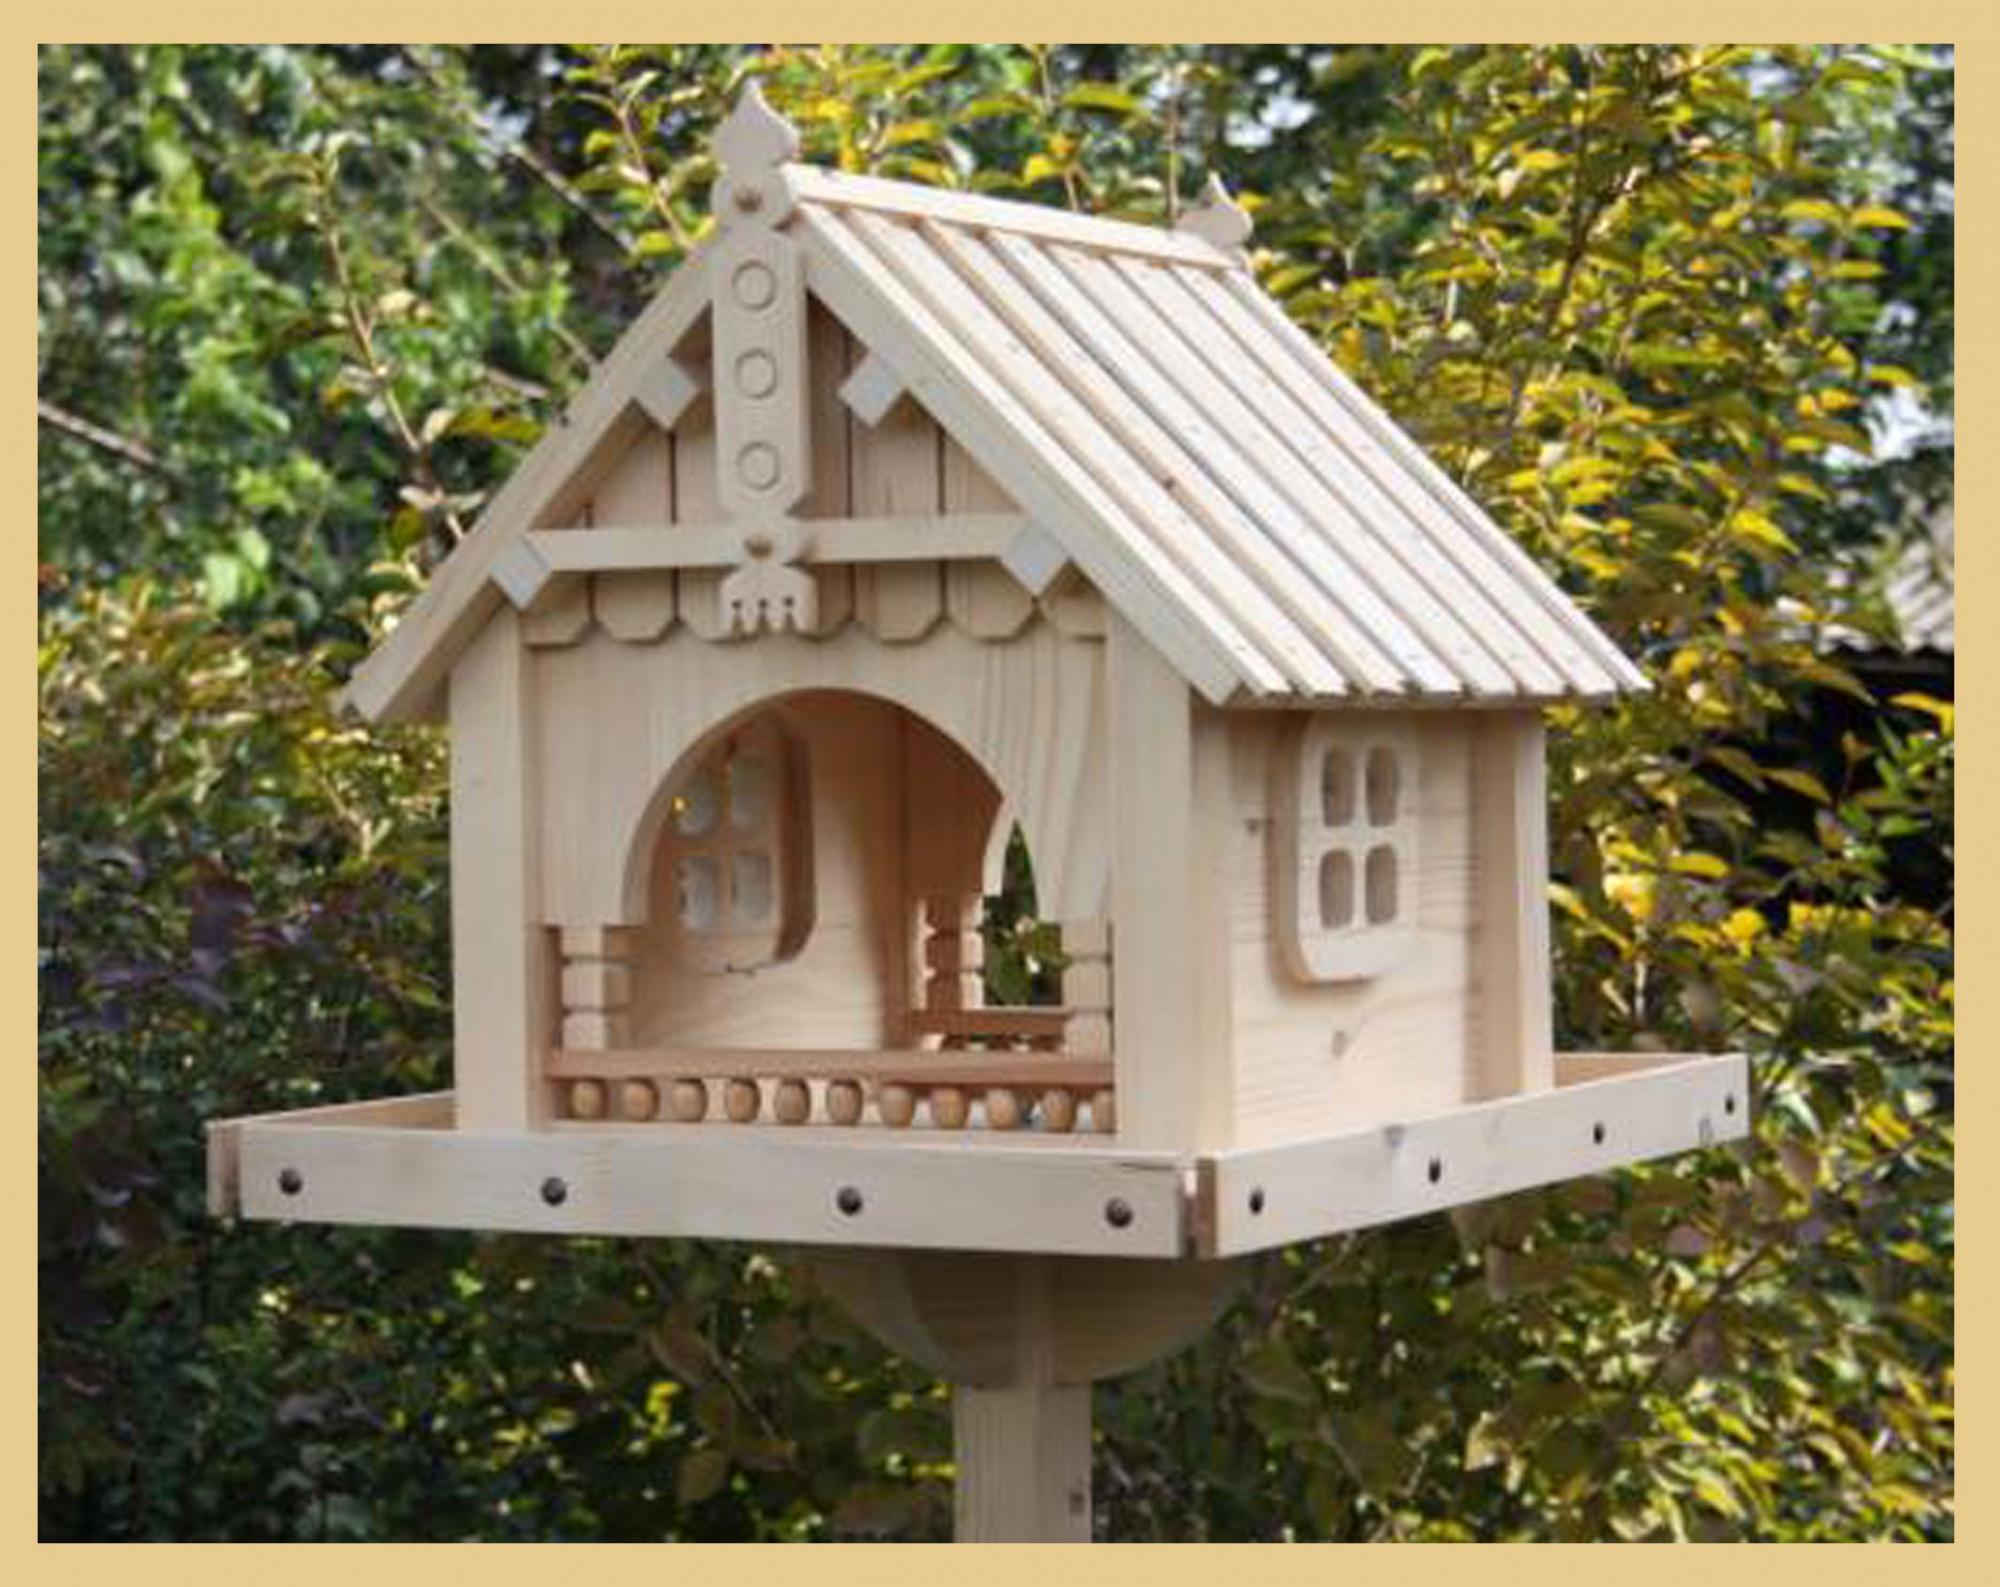 Сделать кормушку для птиц из дерева своими